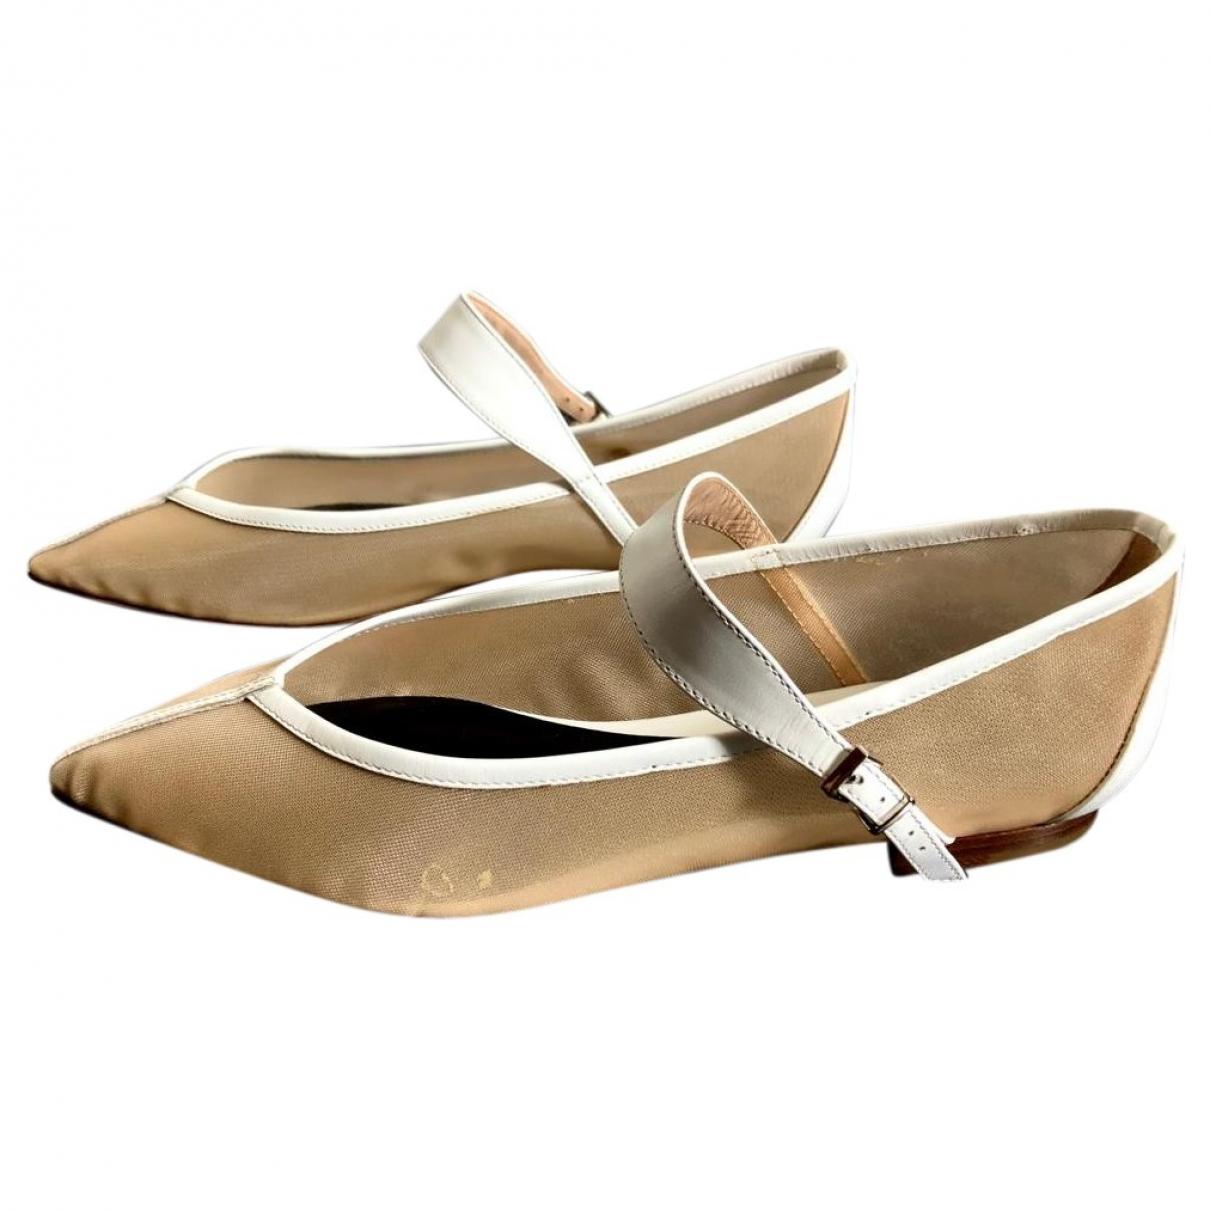 Emporio Armani - Ballerines   pour femme en cuir - beige